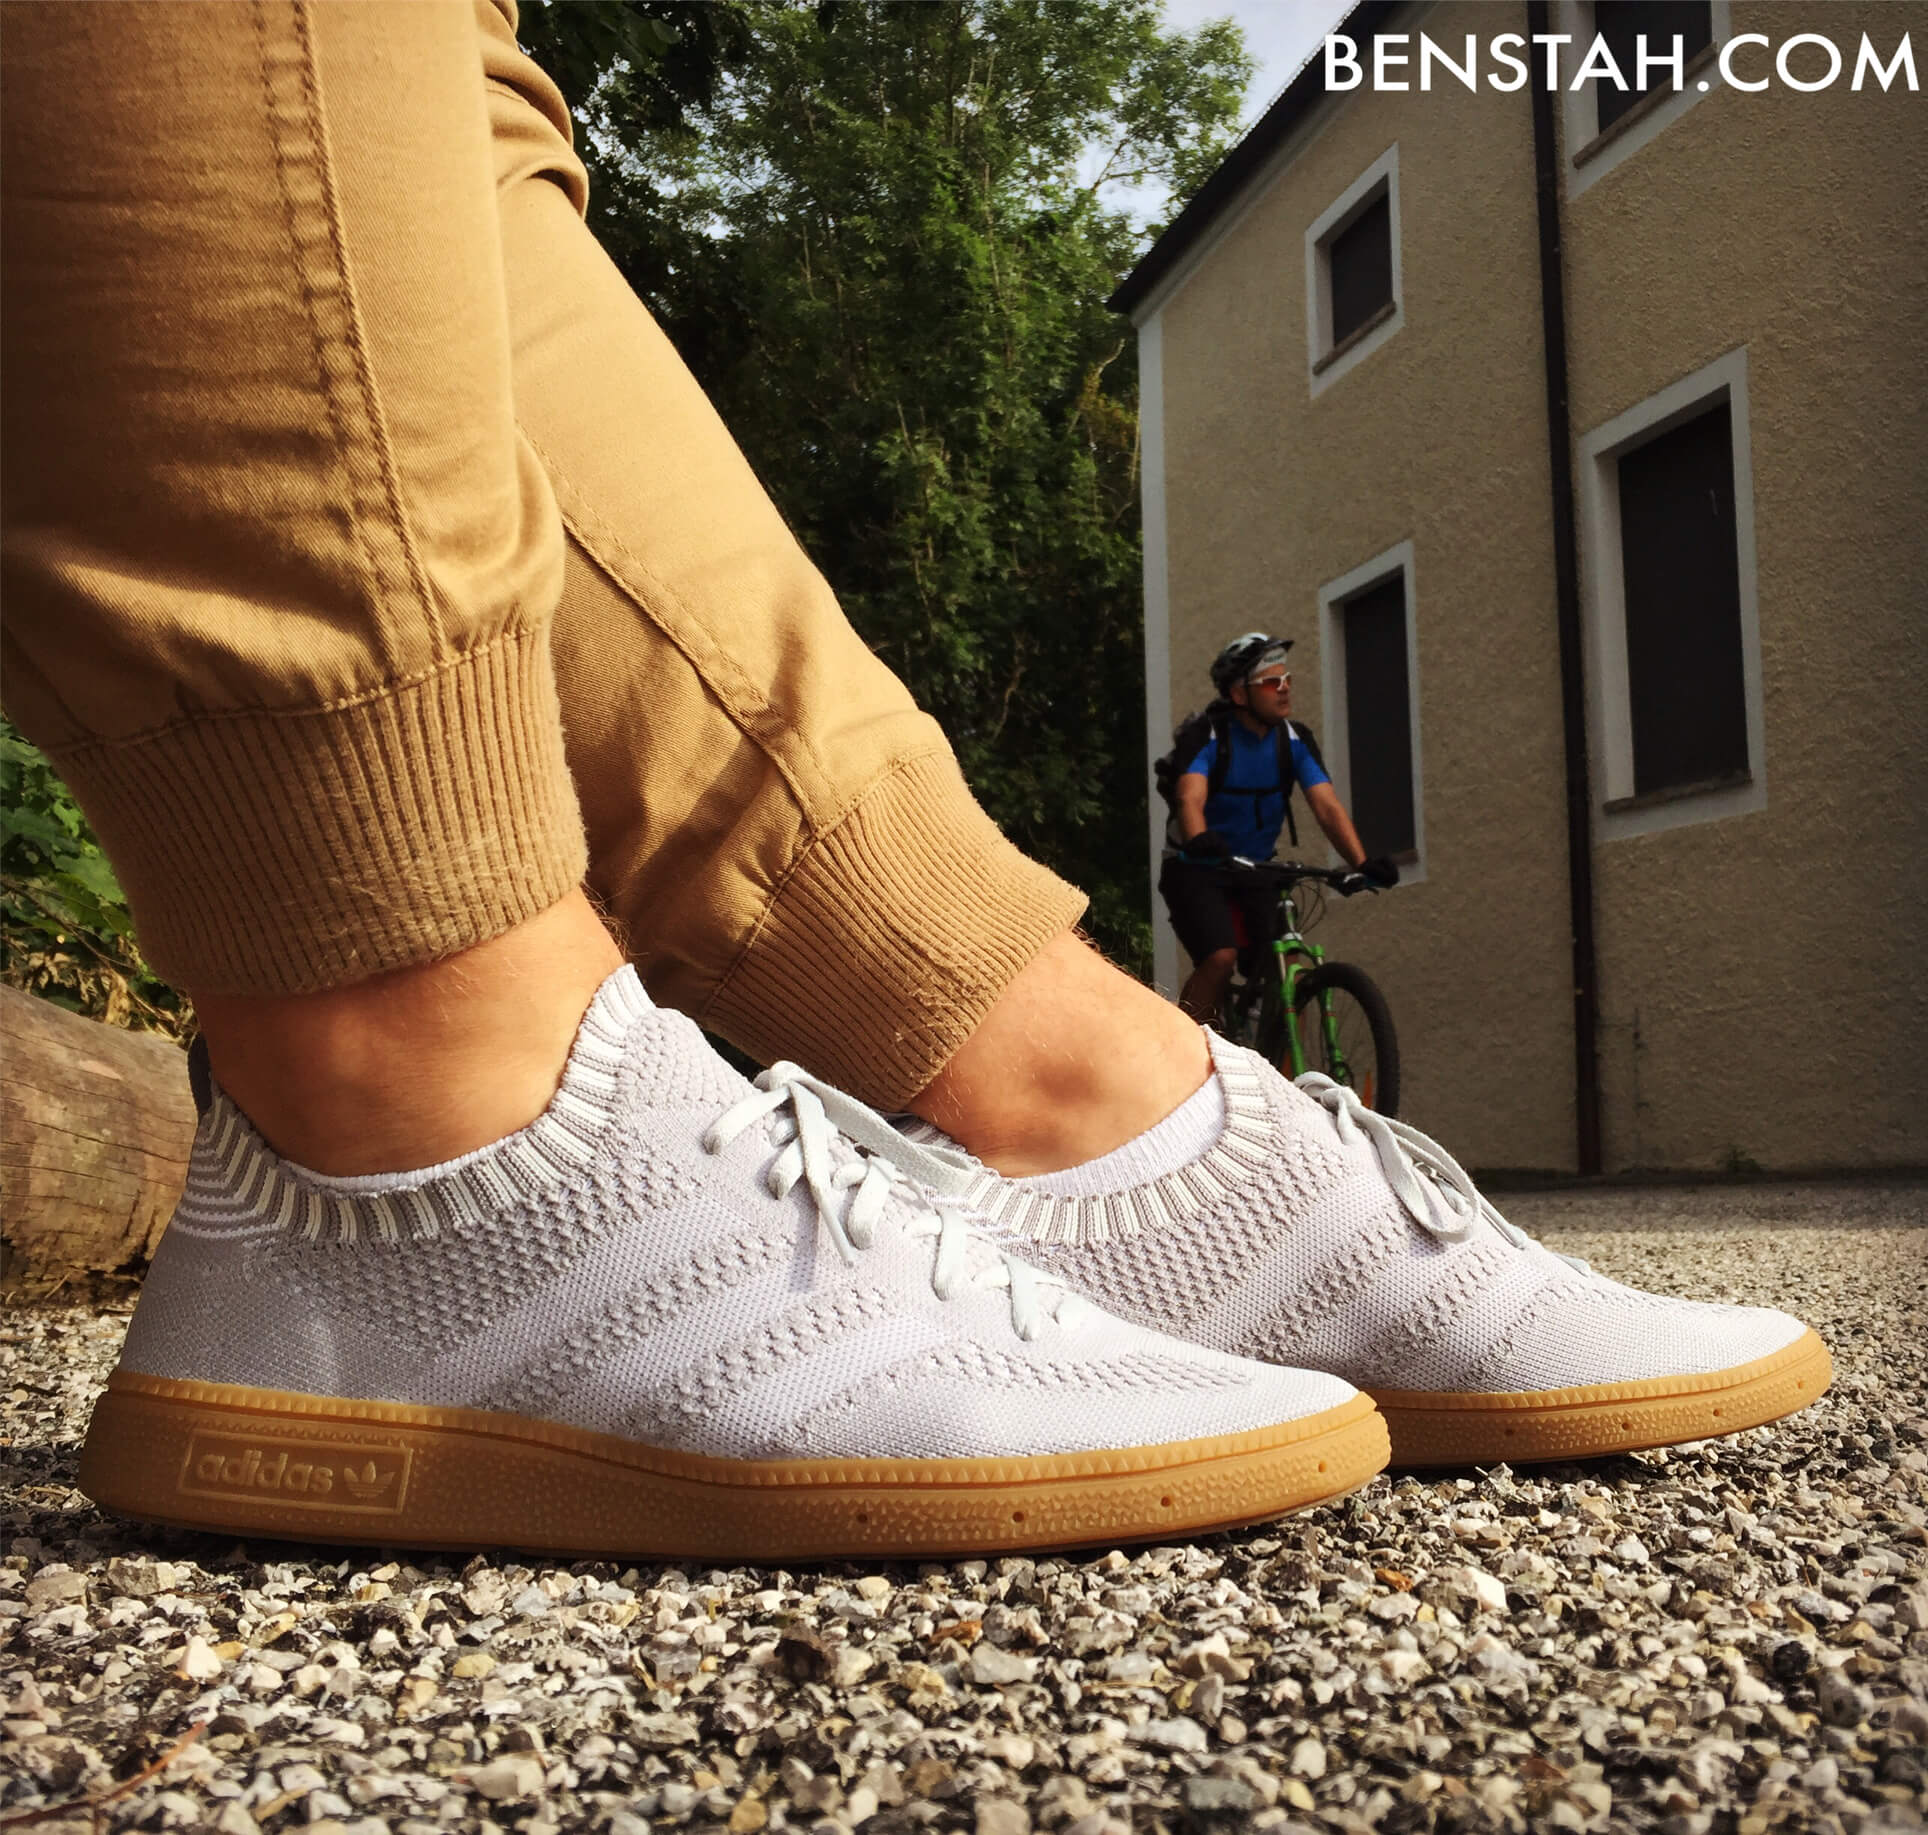 adidas-very-spezial-primeknit-clear-onix-side-view-1-benstah-onfeet